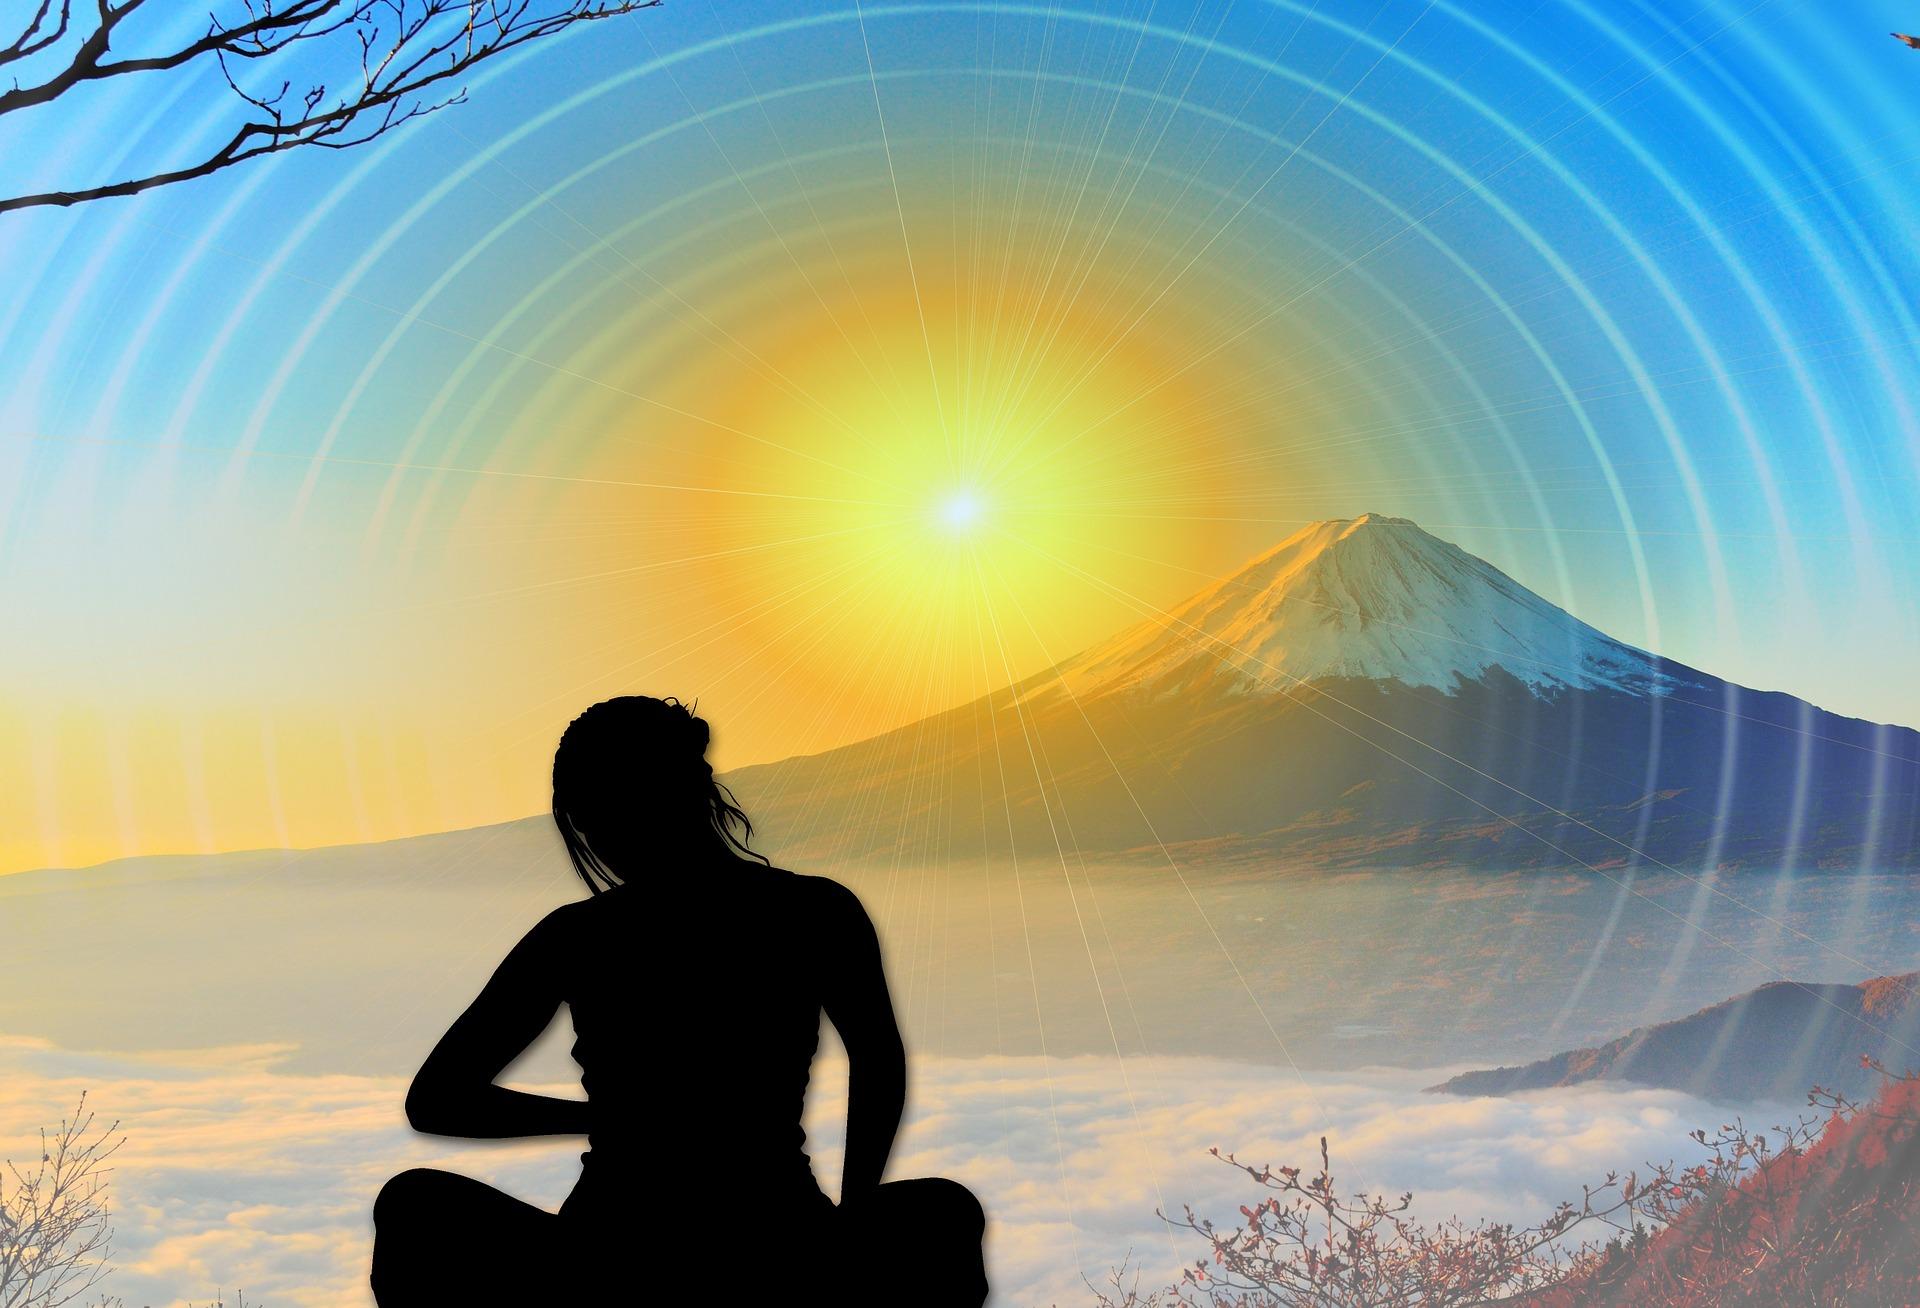 Les symptômes de l'Éveil Spirituel